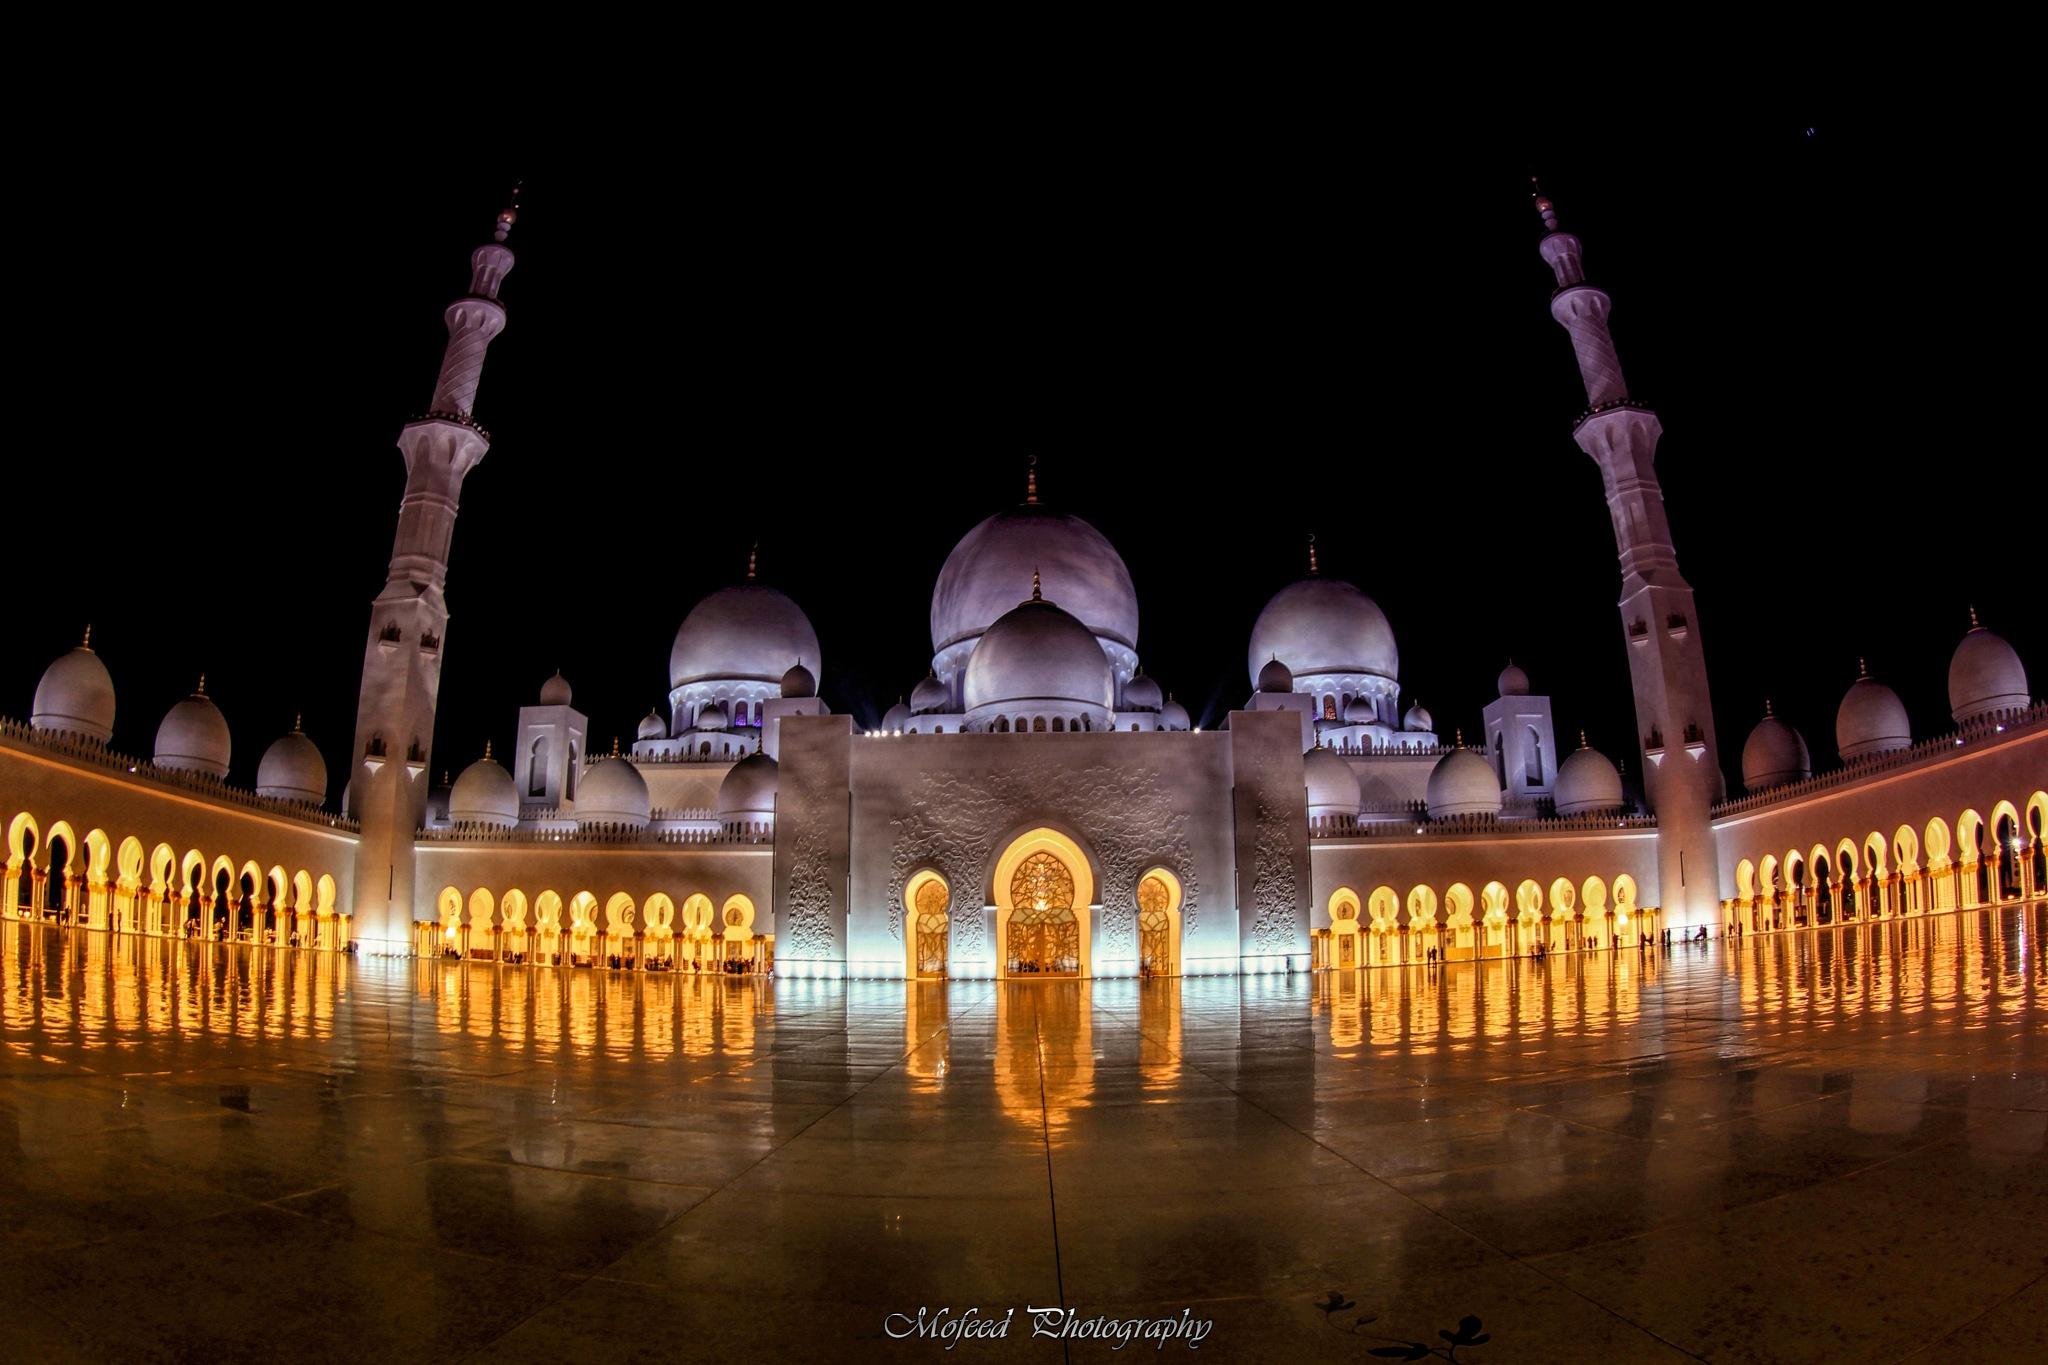 Sheikh Zayed Mosque by Mofeed Abu Shalwa